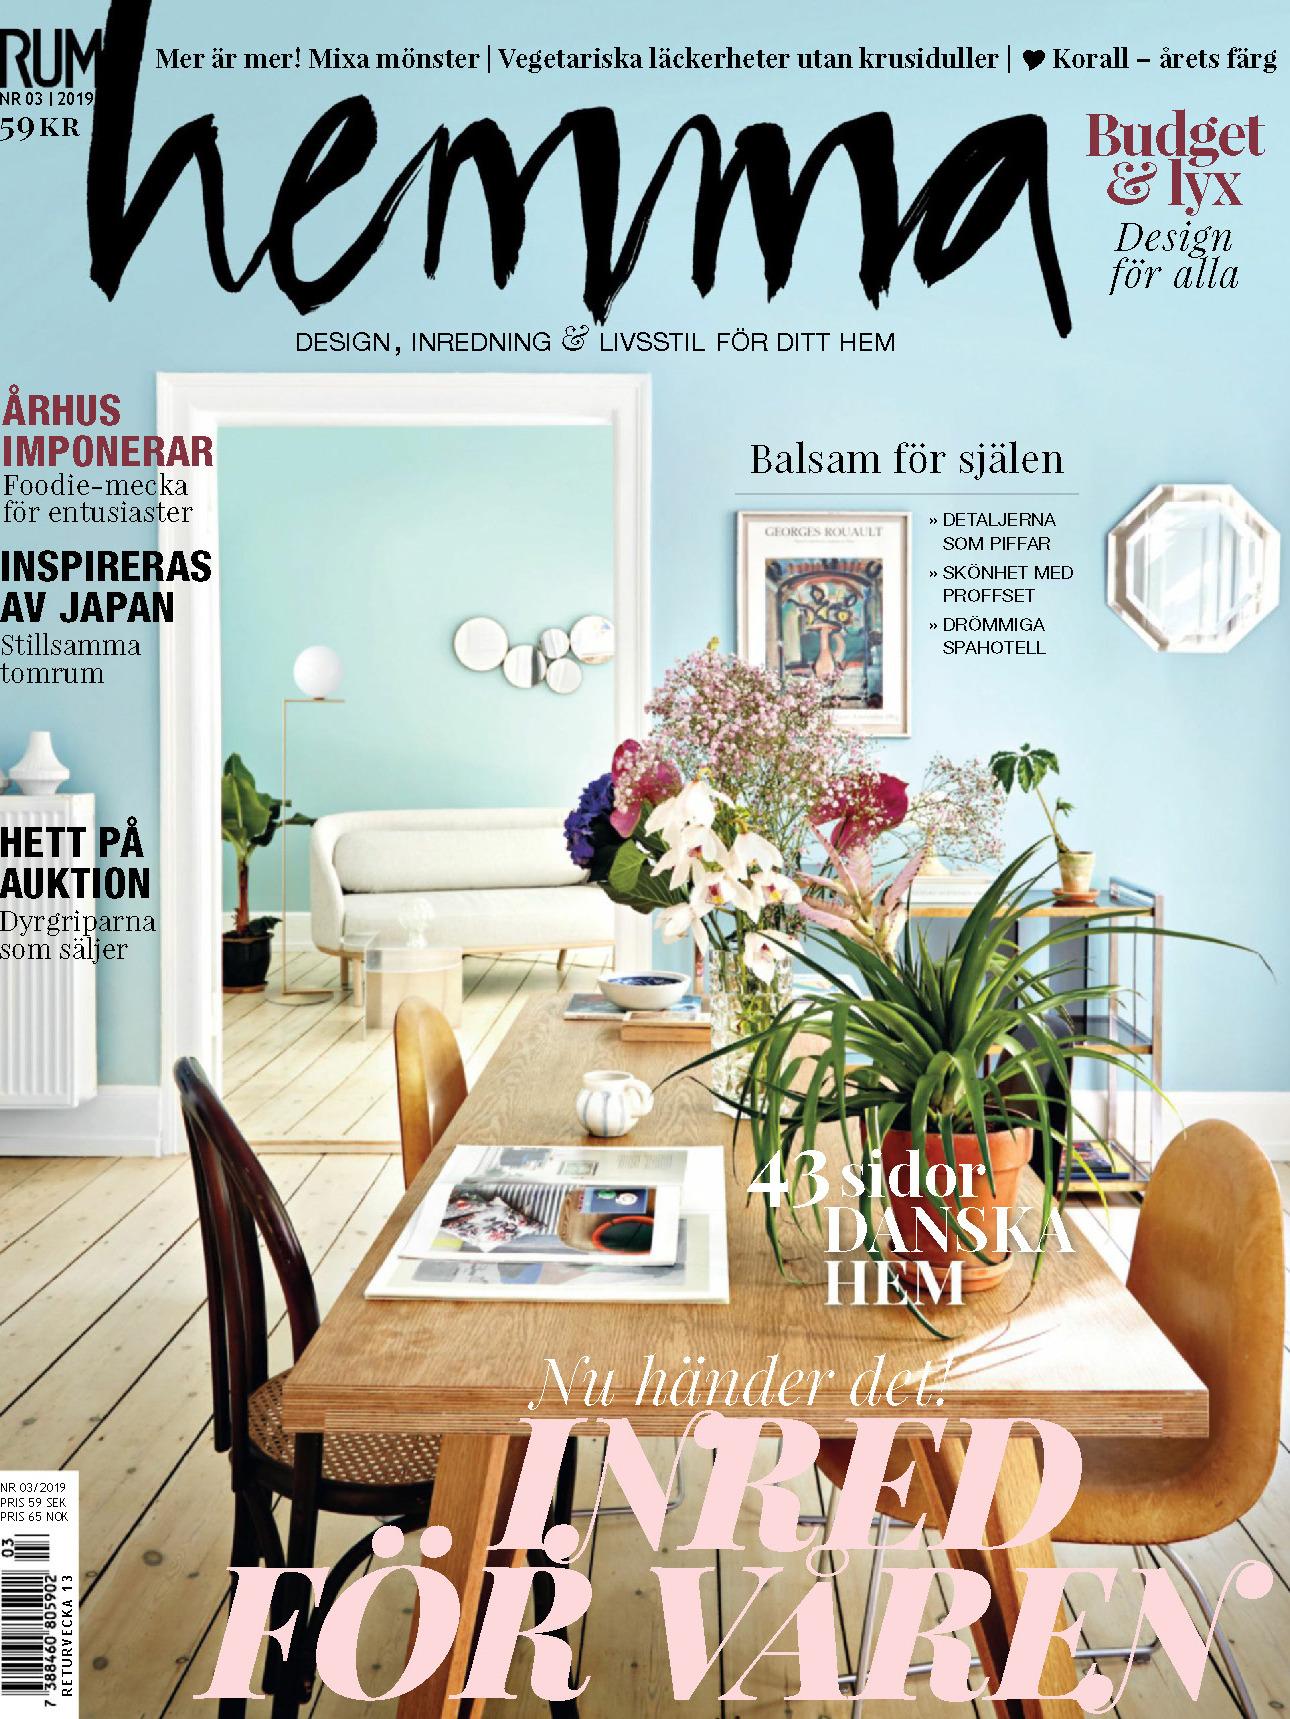 《Rum Hemma》瑞典版时尚家居杂志2019年03月号